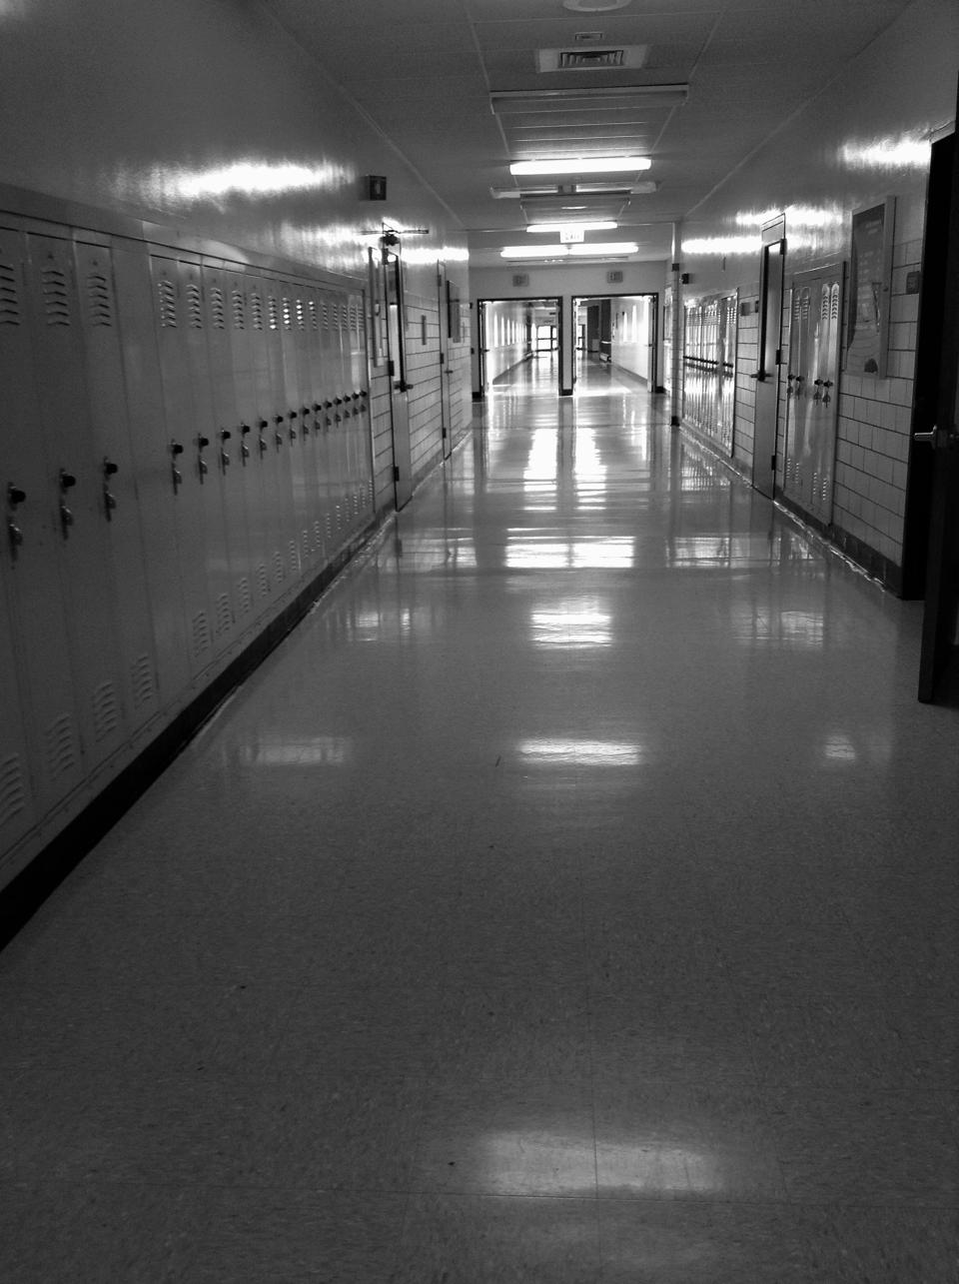 Empty school hall.